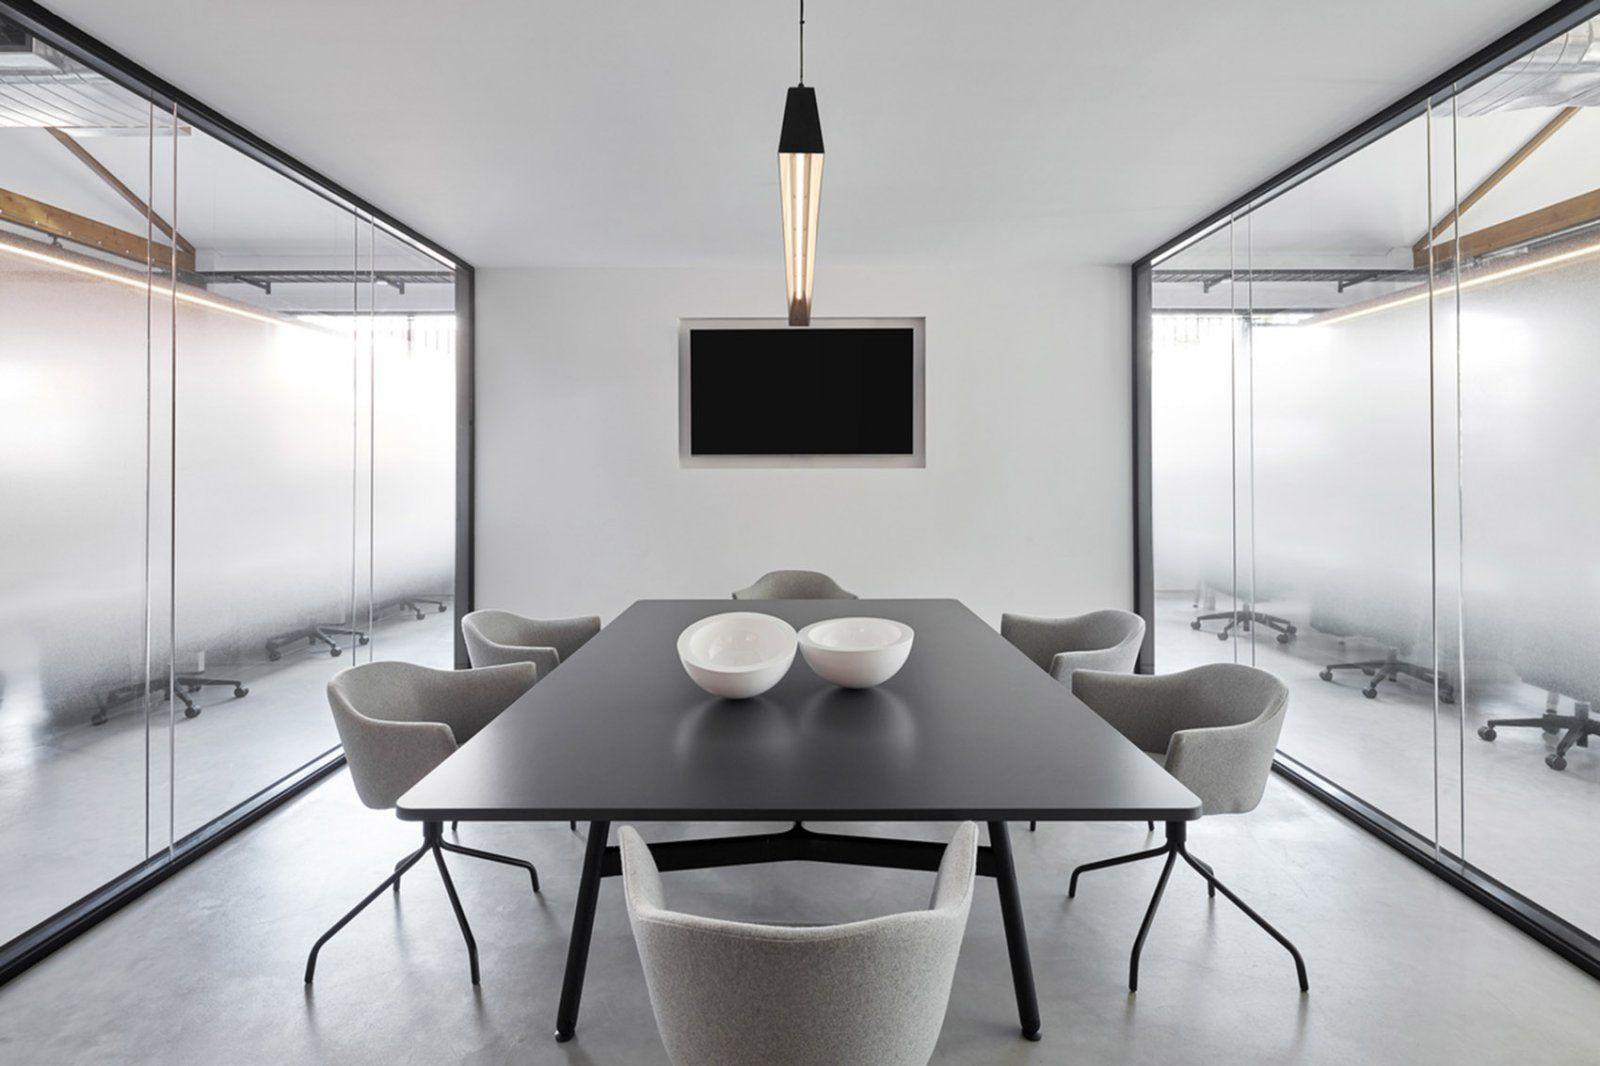 澳大利亚Studio 103设计工作室 | Studio 103|Studio 103 - 7